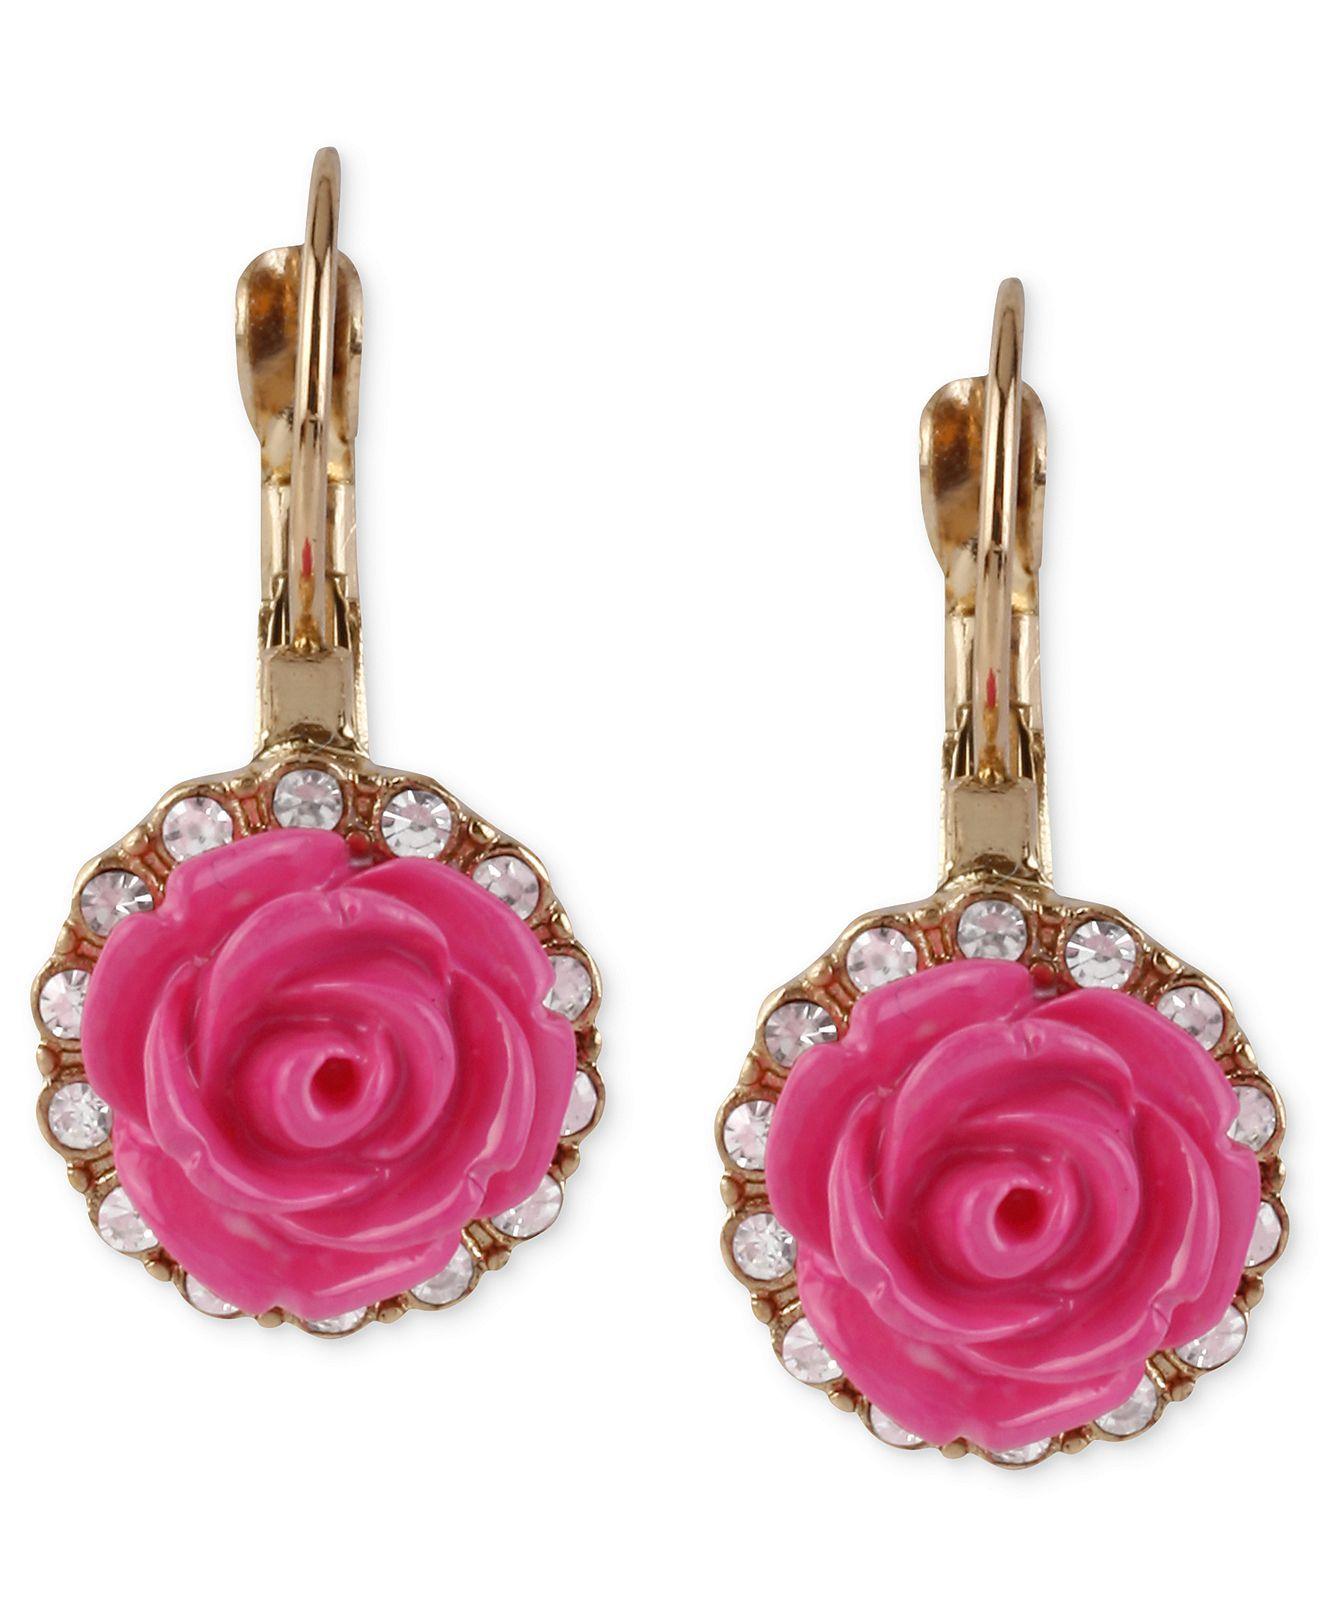 Betsey Johnson Earrings Betsey johnson earrings, Betsey